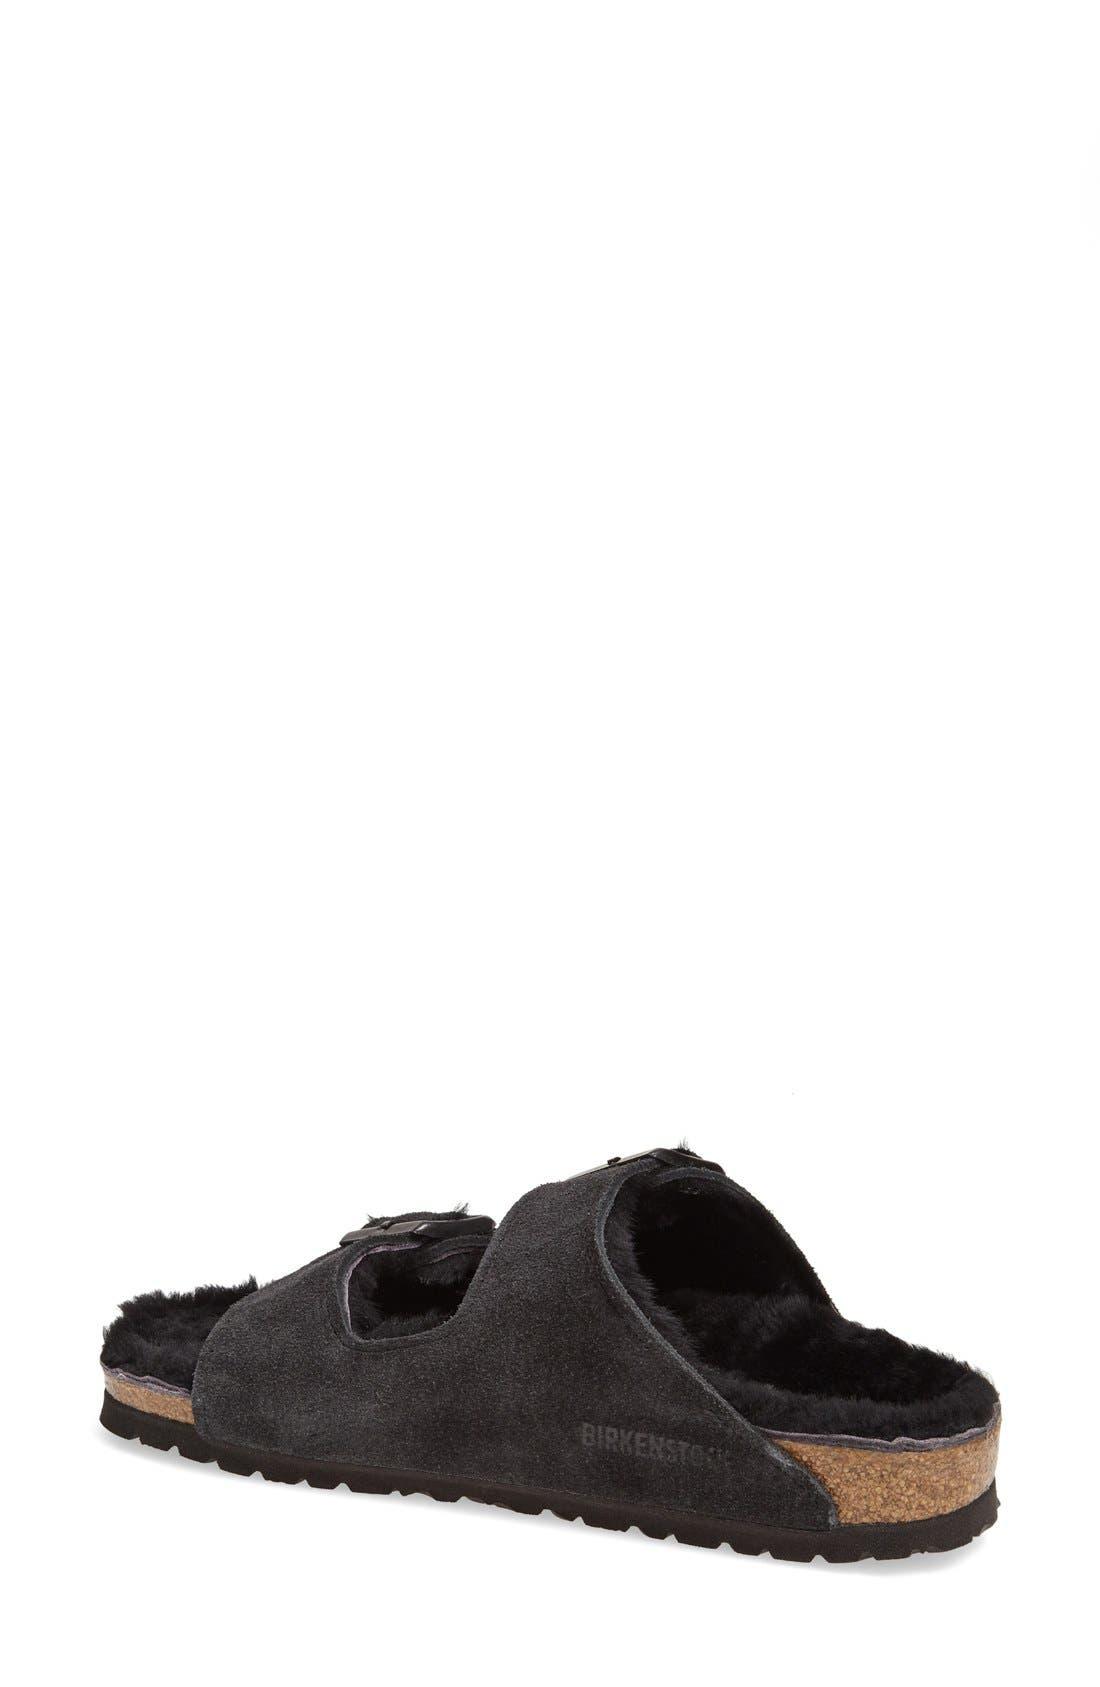 Alternate Image 2  - Birkenstock 'Arizona' Genuine Shearling Lined Sandal (Women)